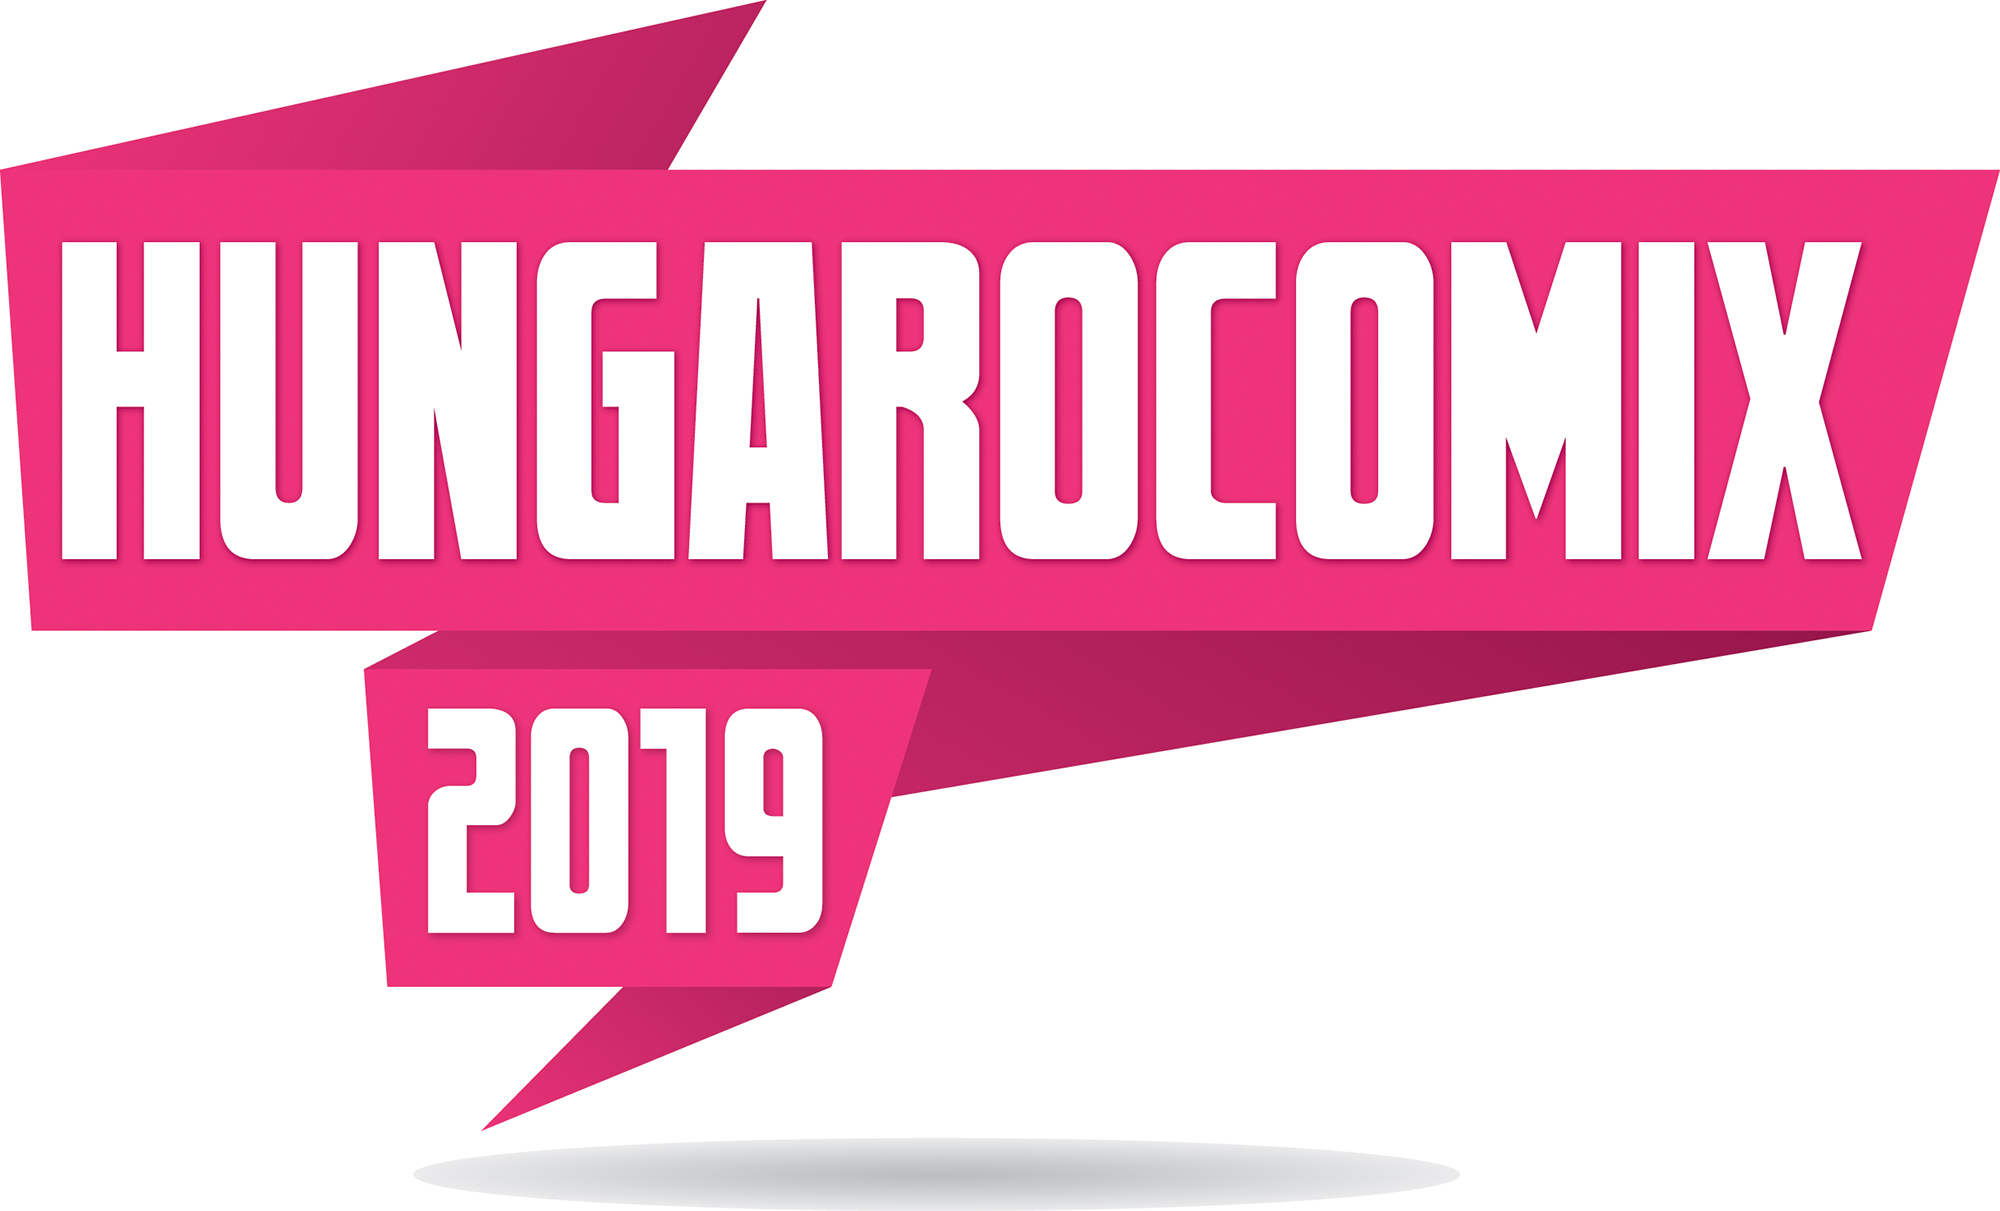 hungarocomix_2019_logo.jpg